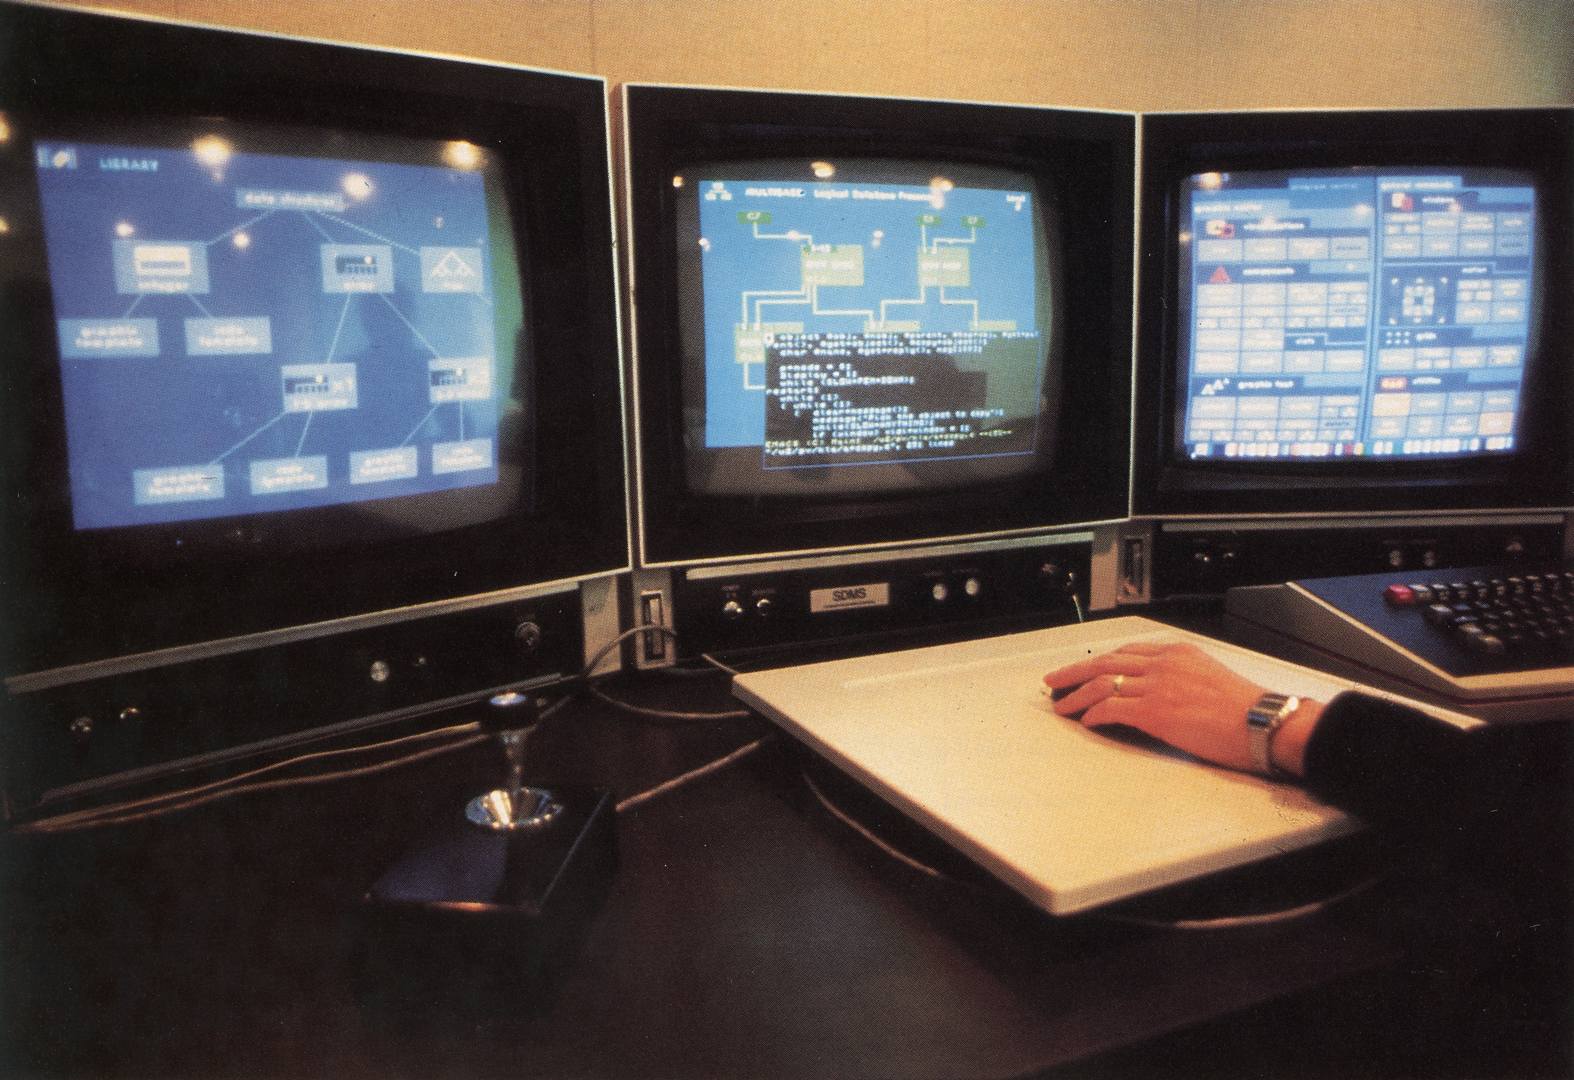 ©, Computer Corporation of America, Program Visualzation